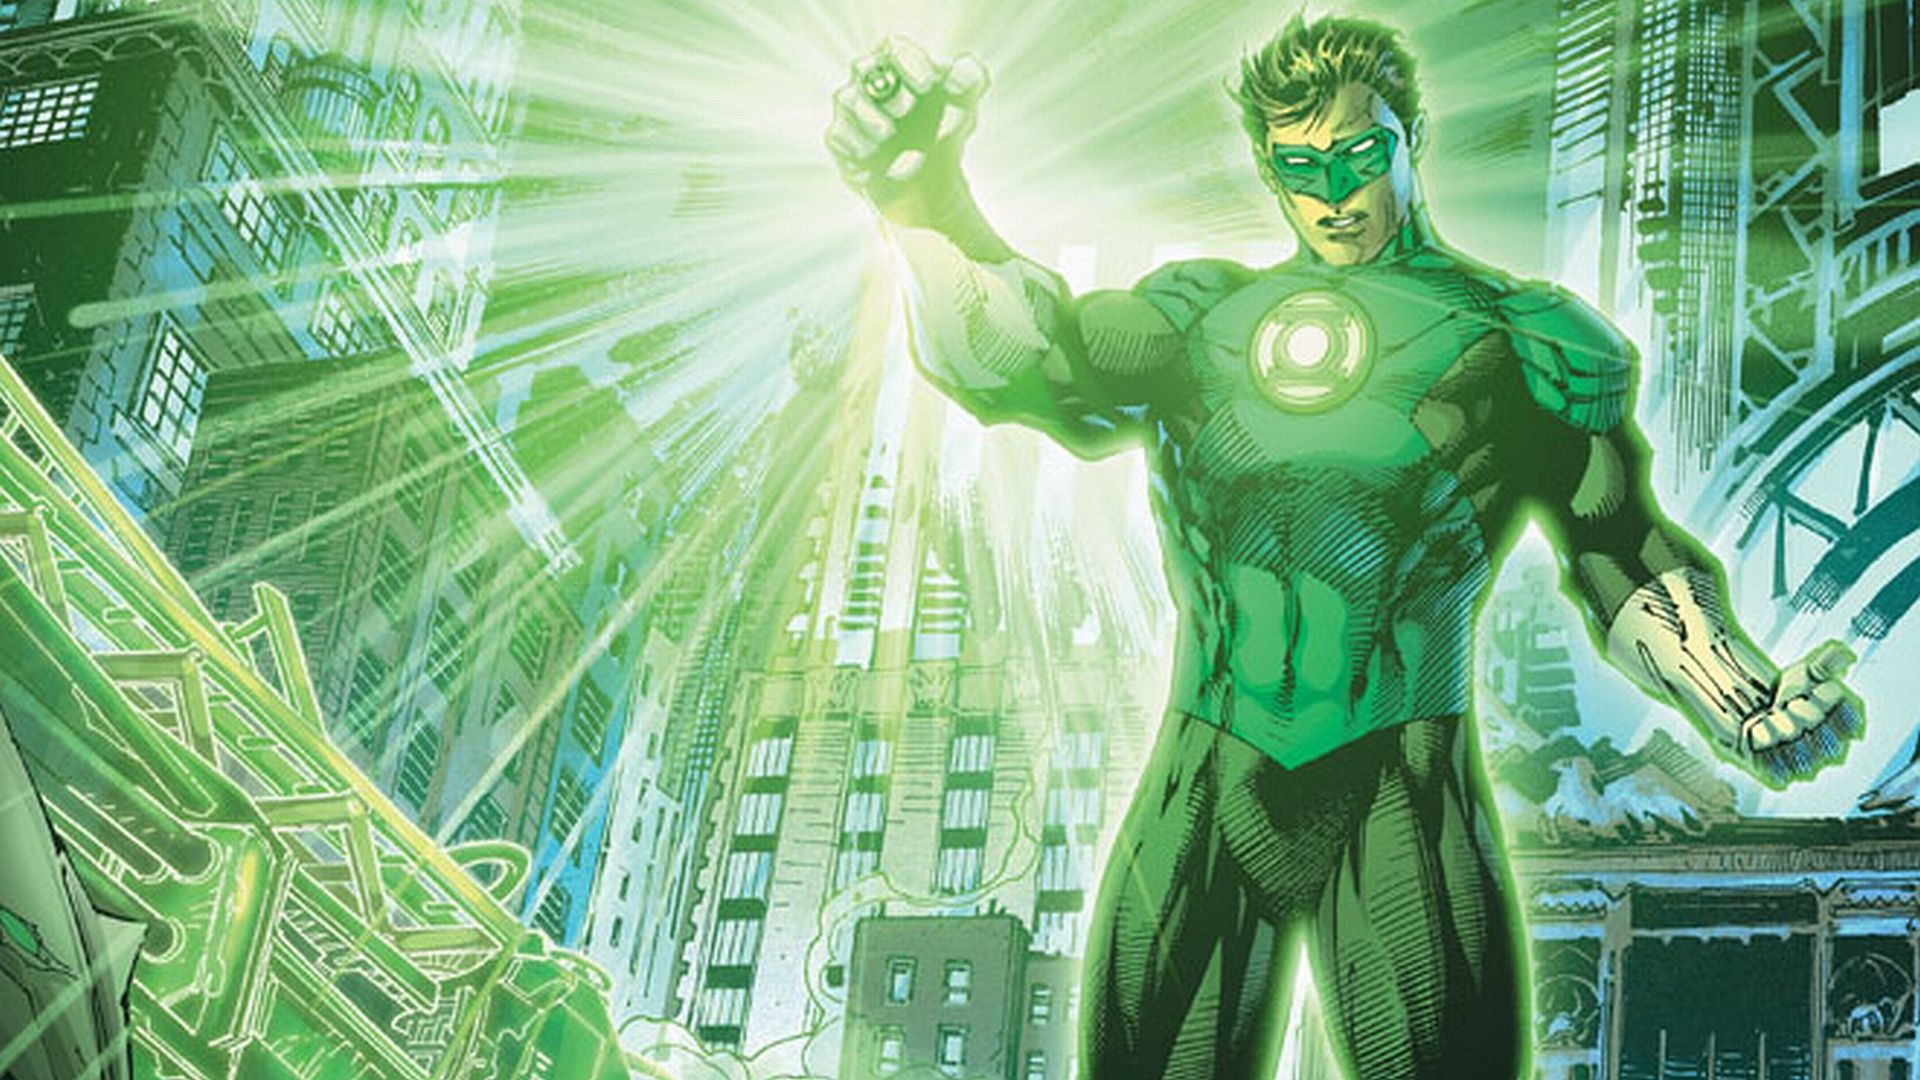 Green Lantern New 52 Wallpapers - Top Free Green Lantern ...